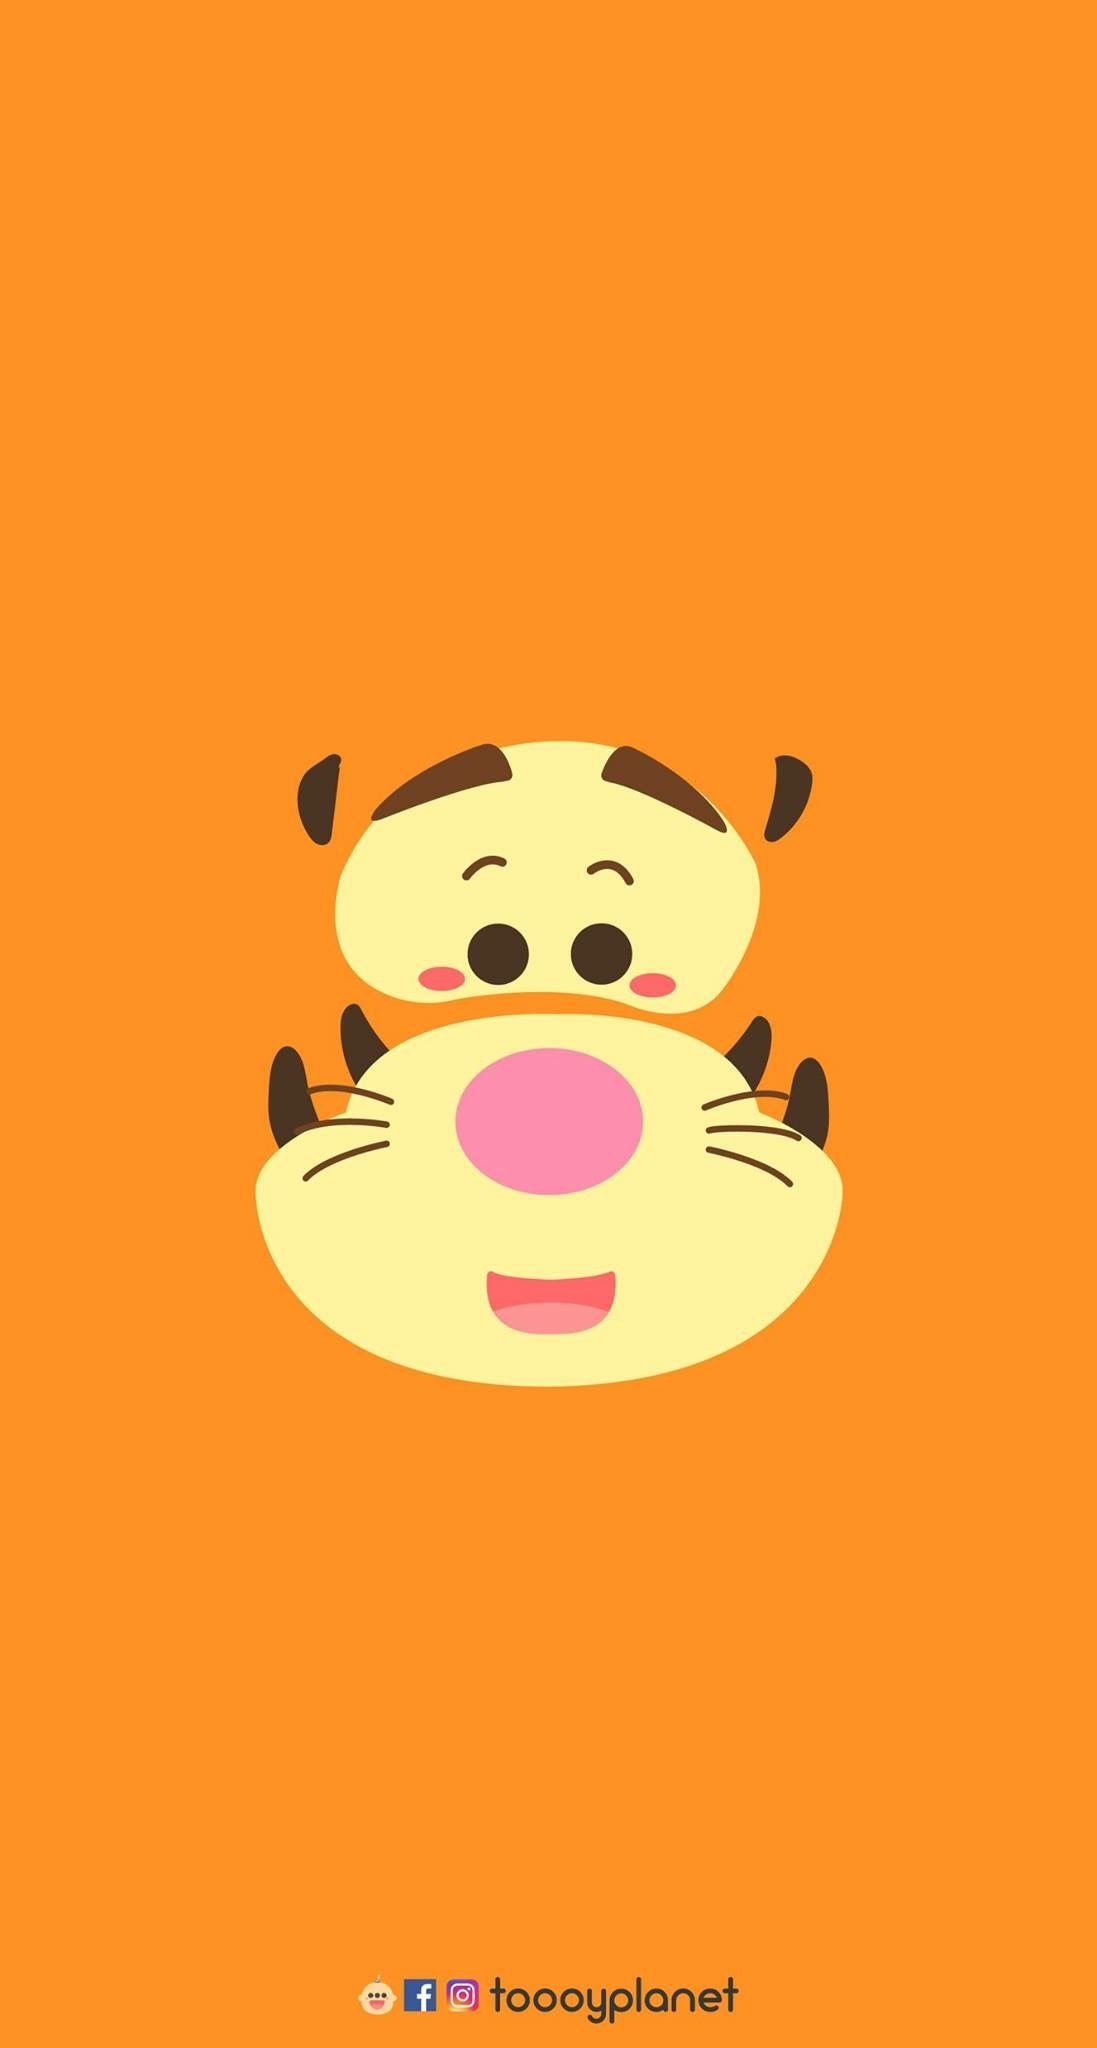 Cute Pooh Bear Wallpapers Pin By Liang Bu Dien On 熊熊維尼 Fondos Para Iphone Fondos